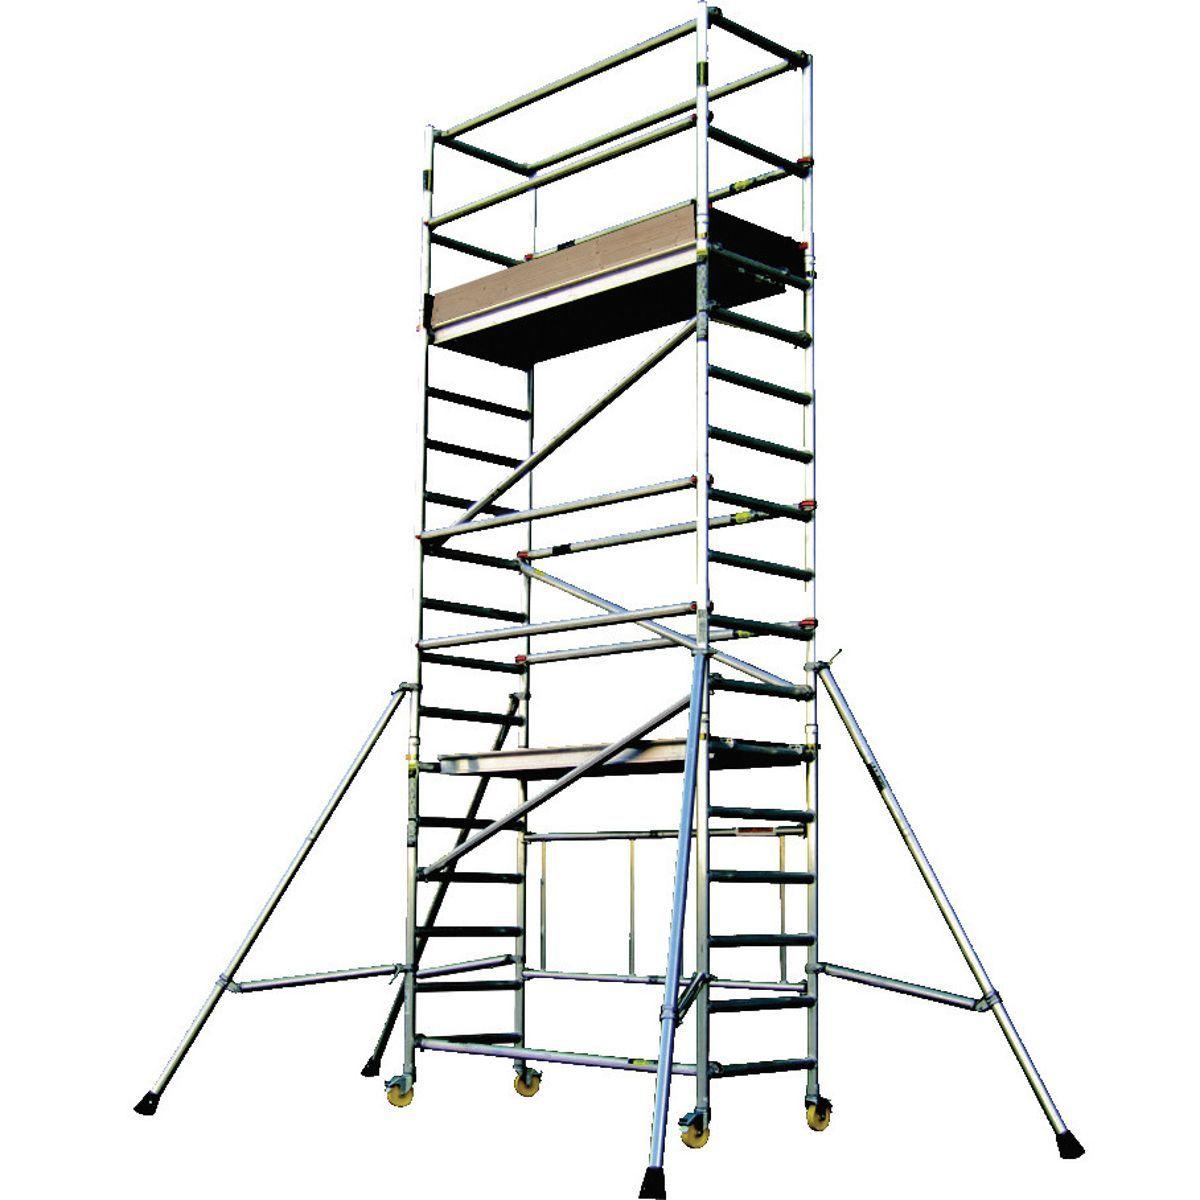 Youngman MiniMax Heavy Duty Platform Towers